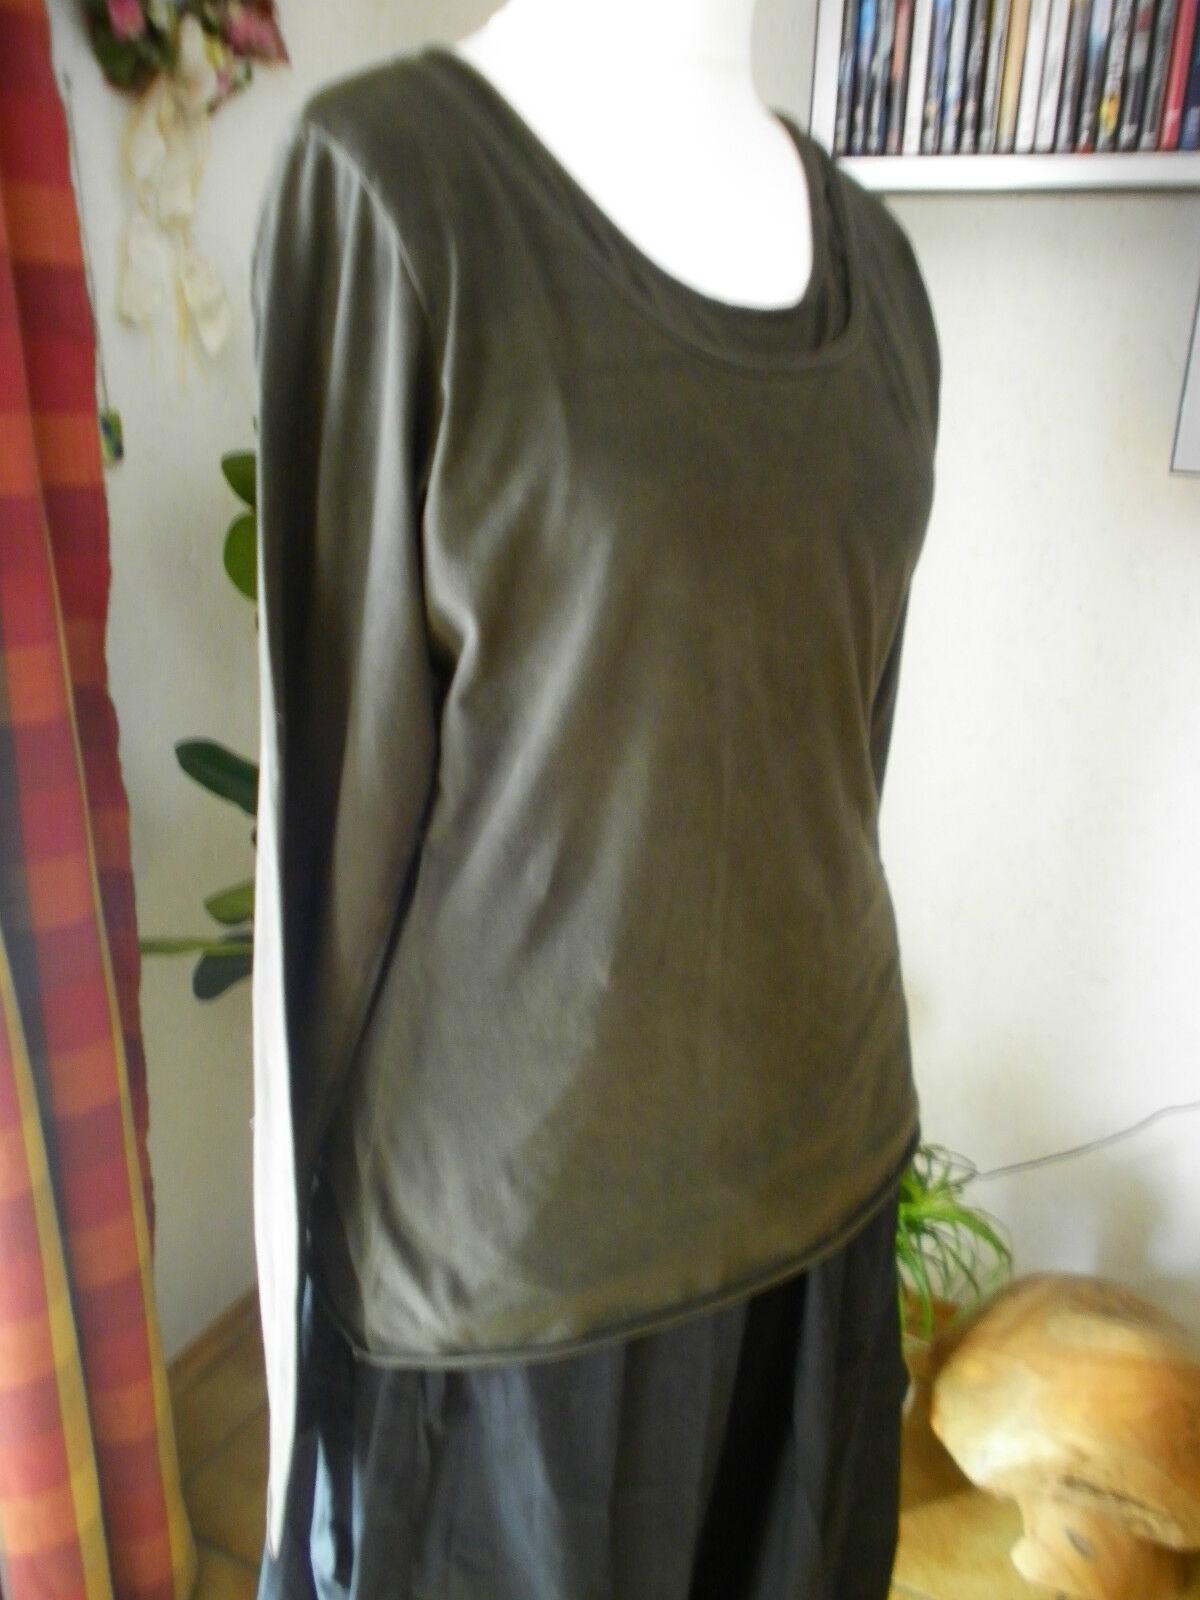 RUNDHOLZ nero Label, shirt tunica, taglia XL, dunkl. dunkl. dunkl. verde oliva marm., Lagenlook, molto bene d4558f